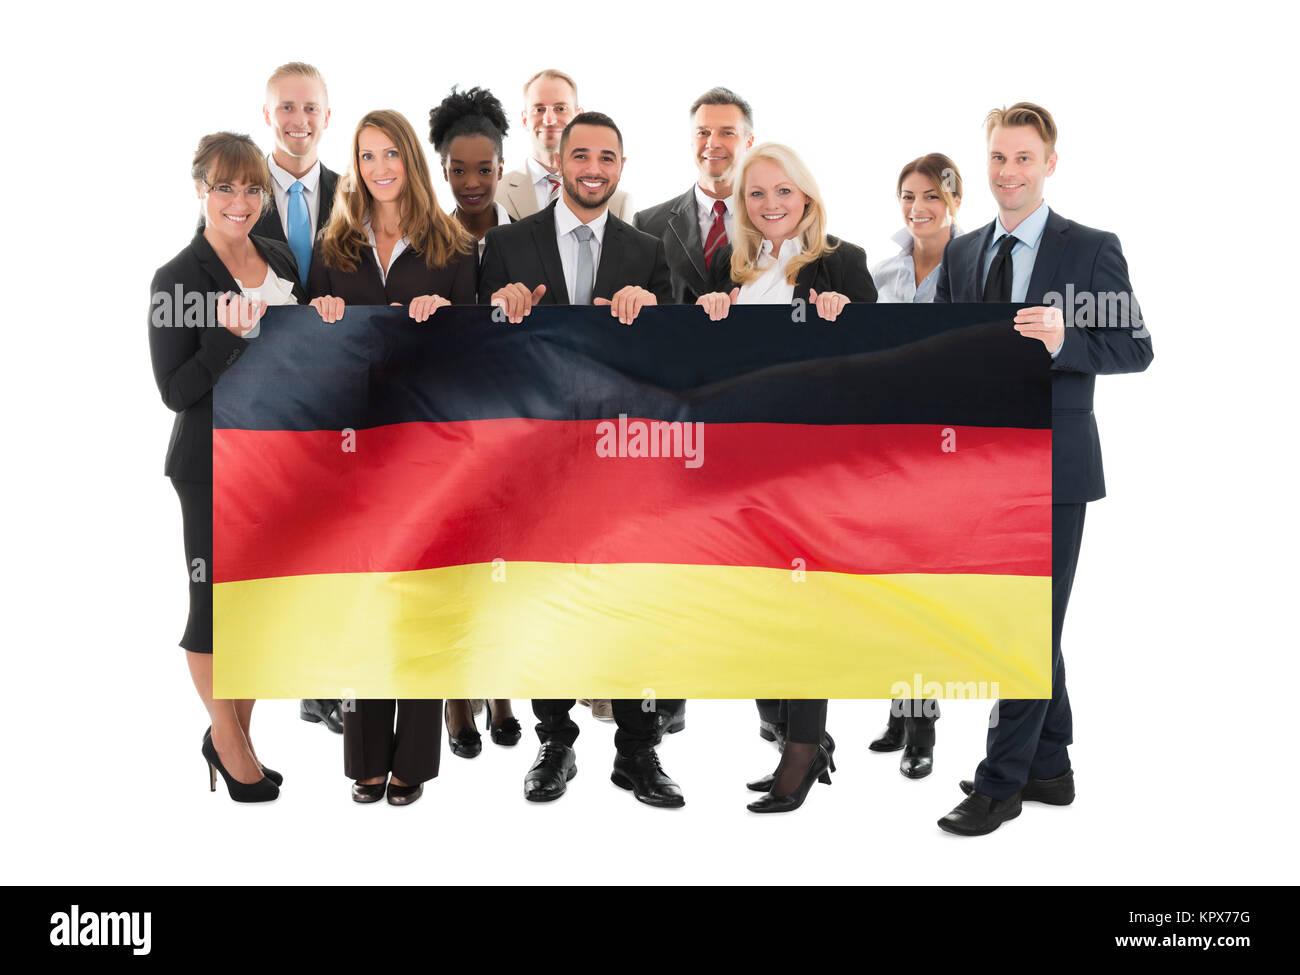 Convaincus de l'Équipe Entreprises ethniques multiples Holding Blank Billboard Photo Stock